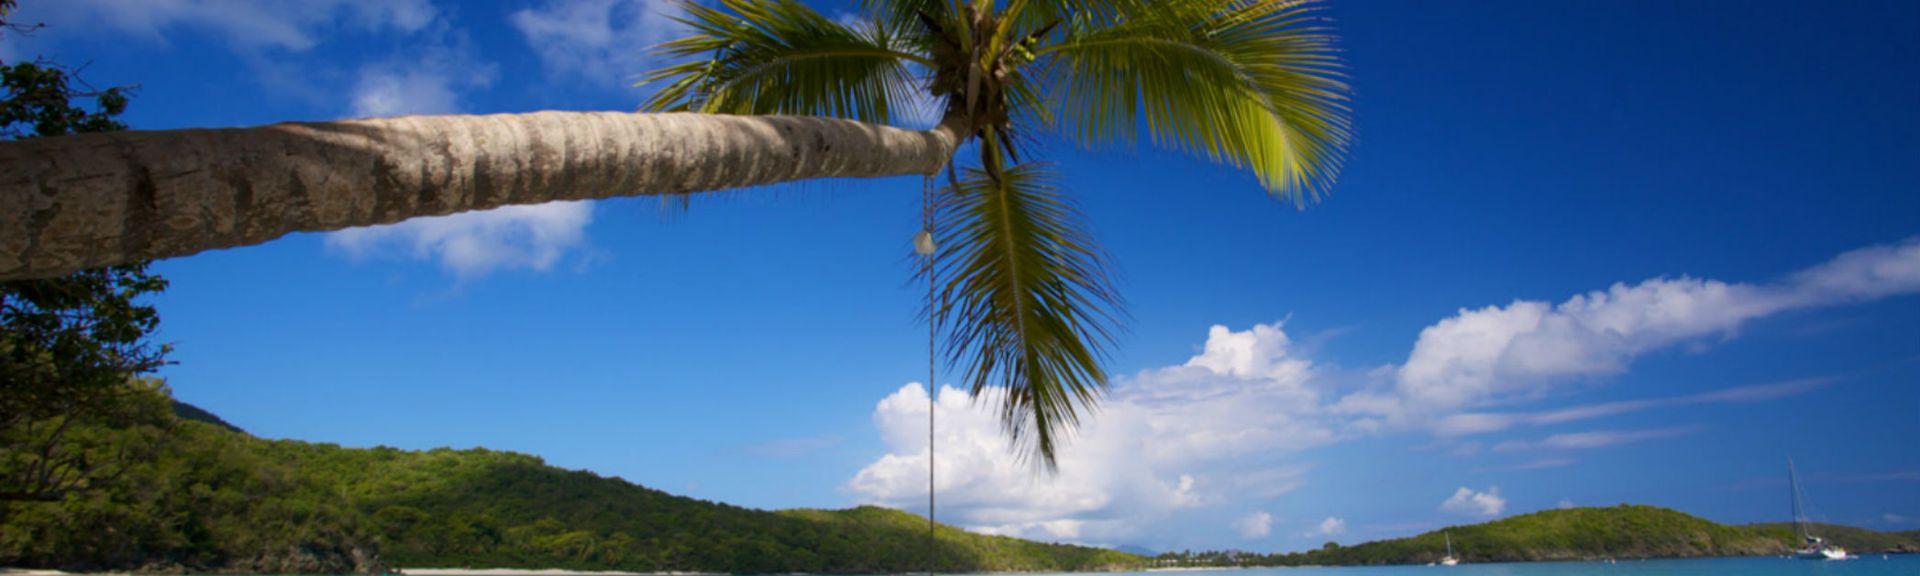 Central, Saint John, US Virgin Islands